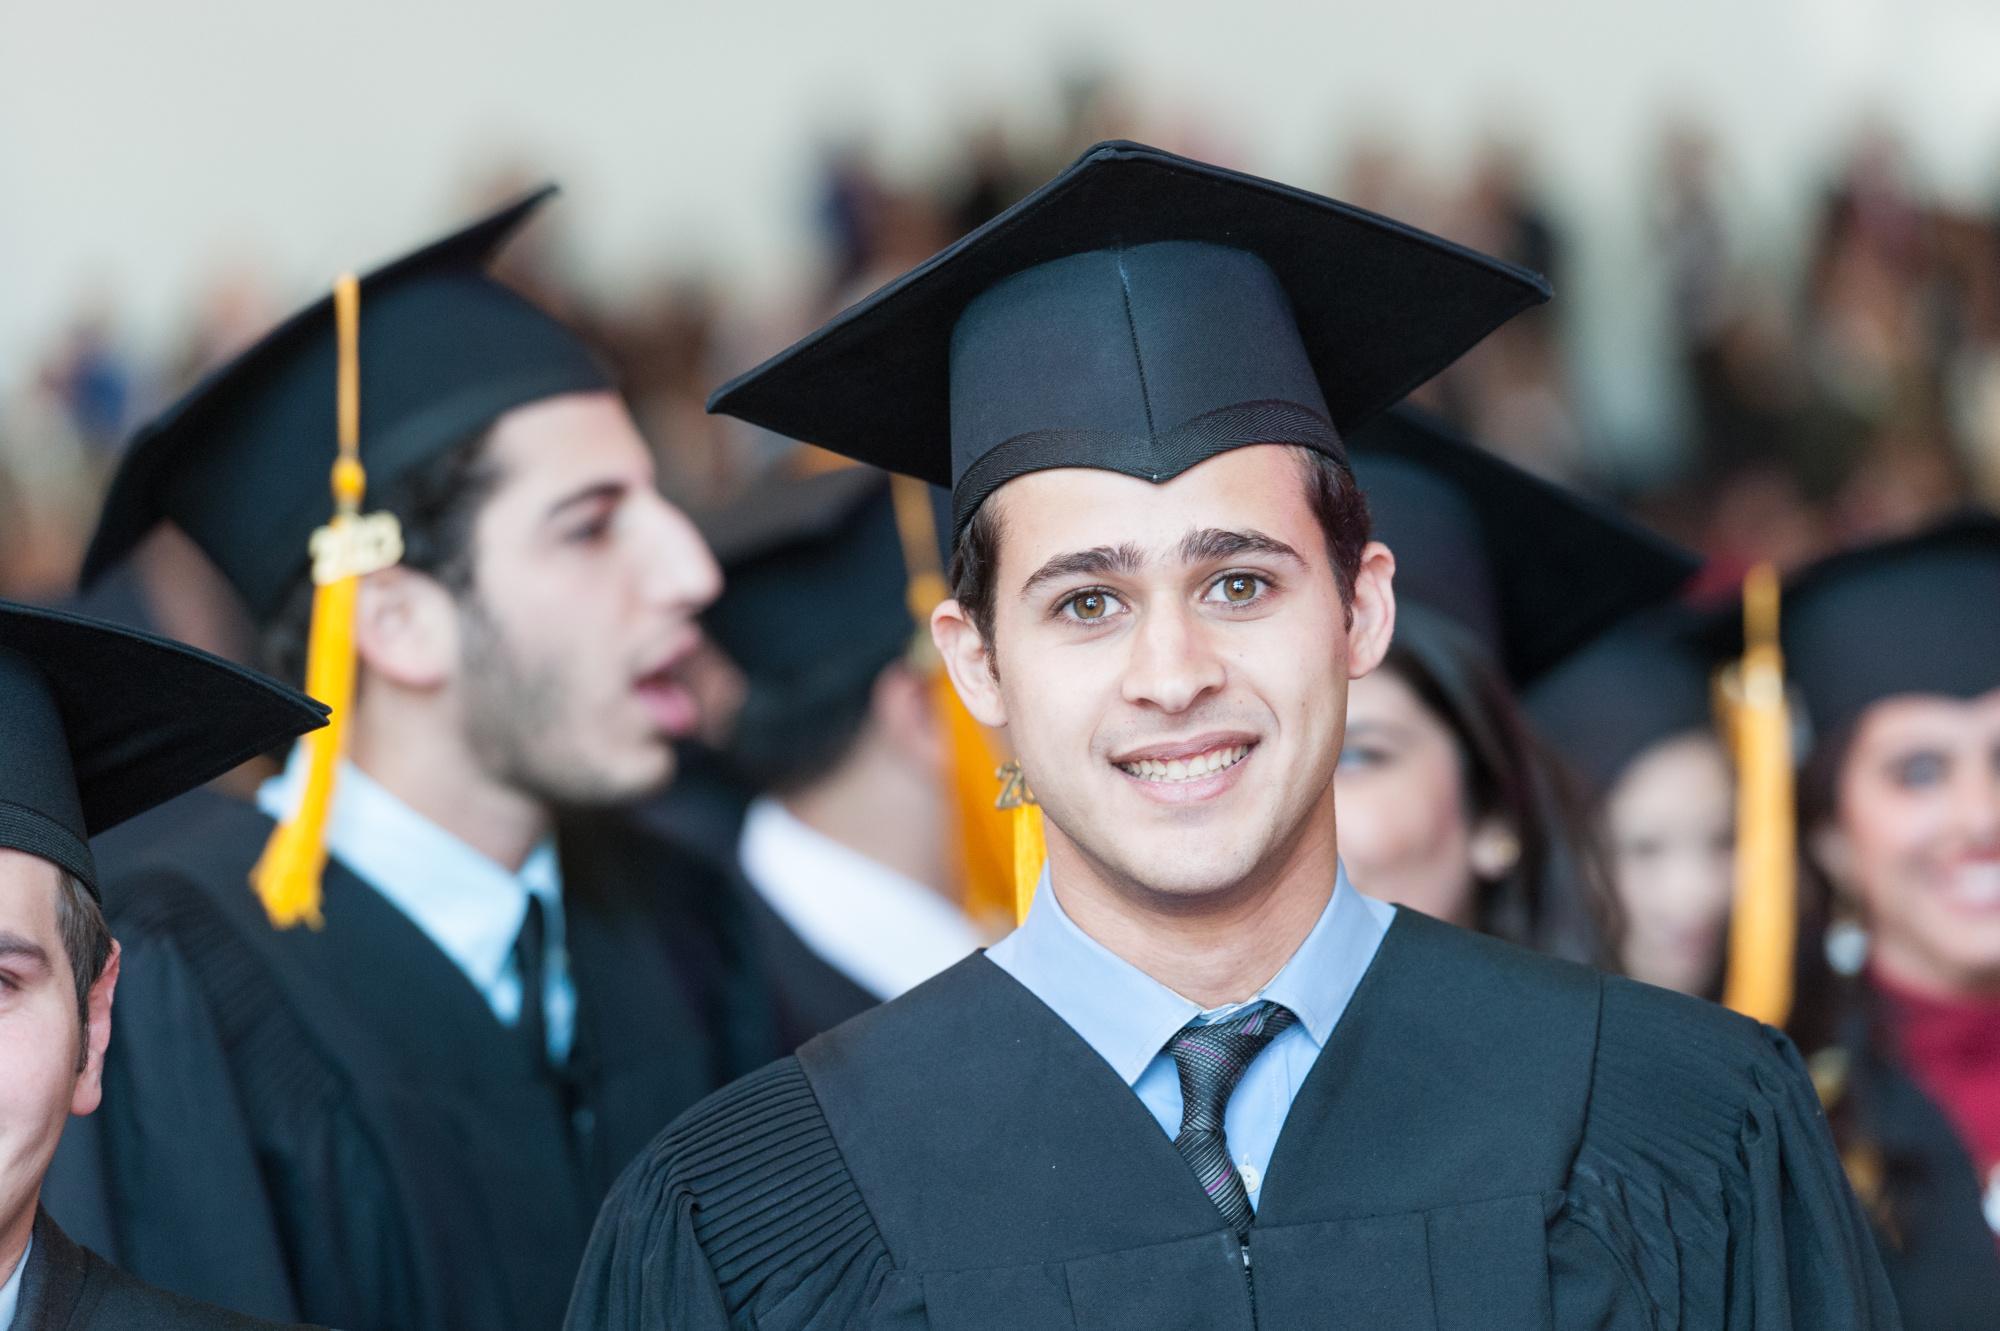 registrar | the american university in cairo